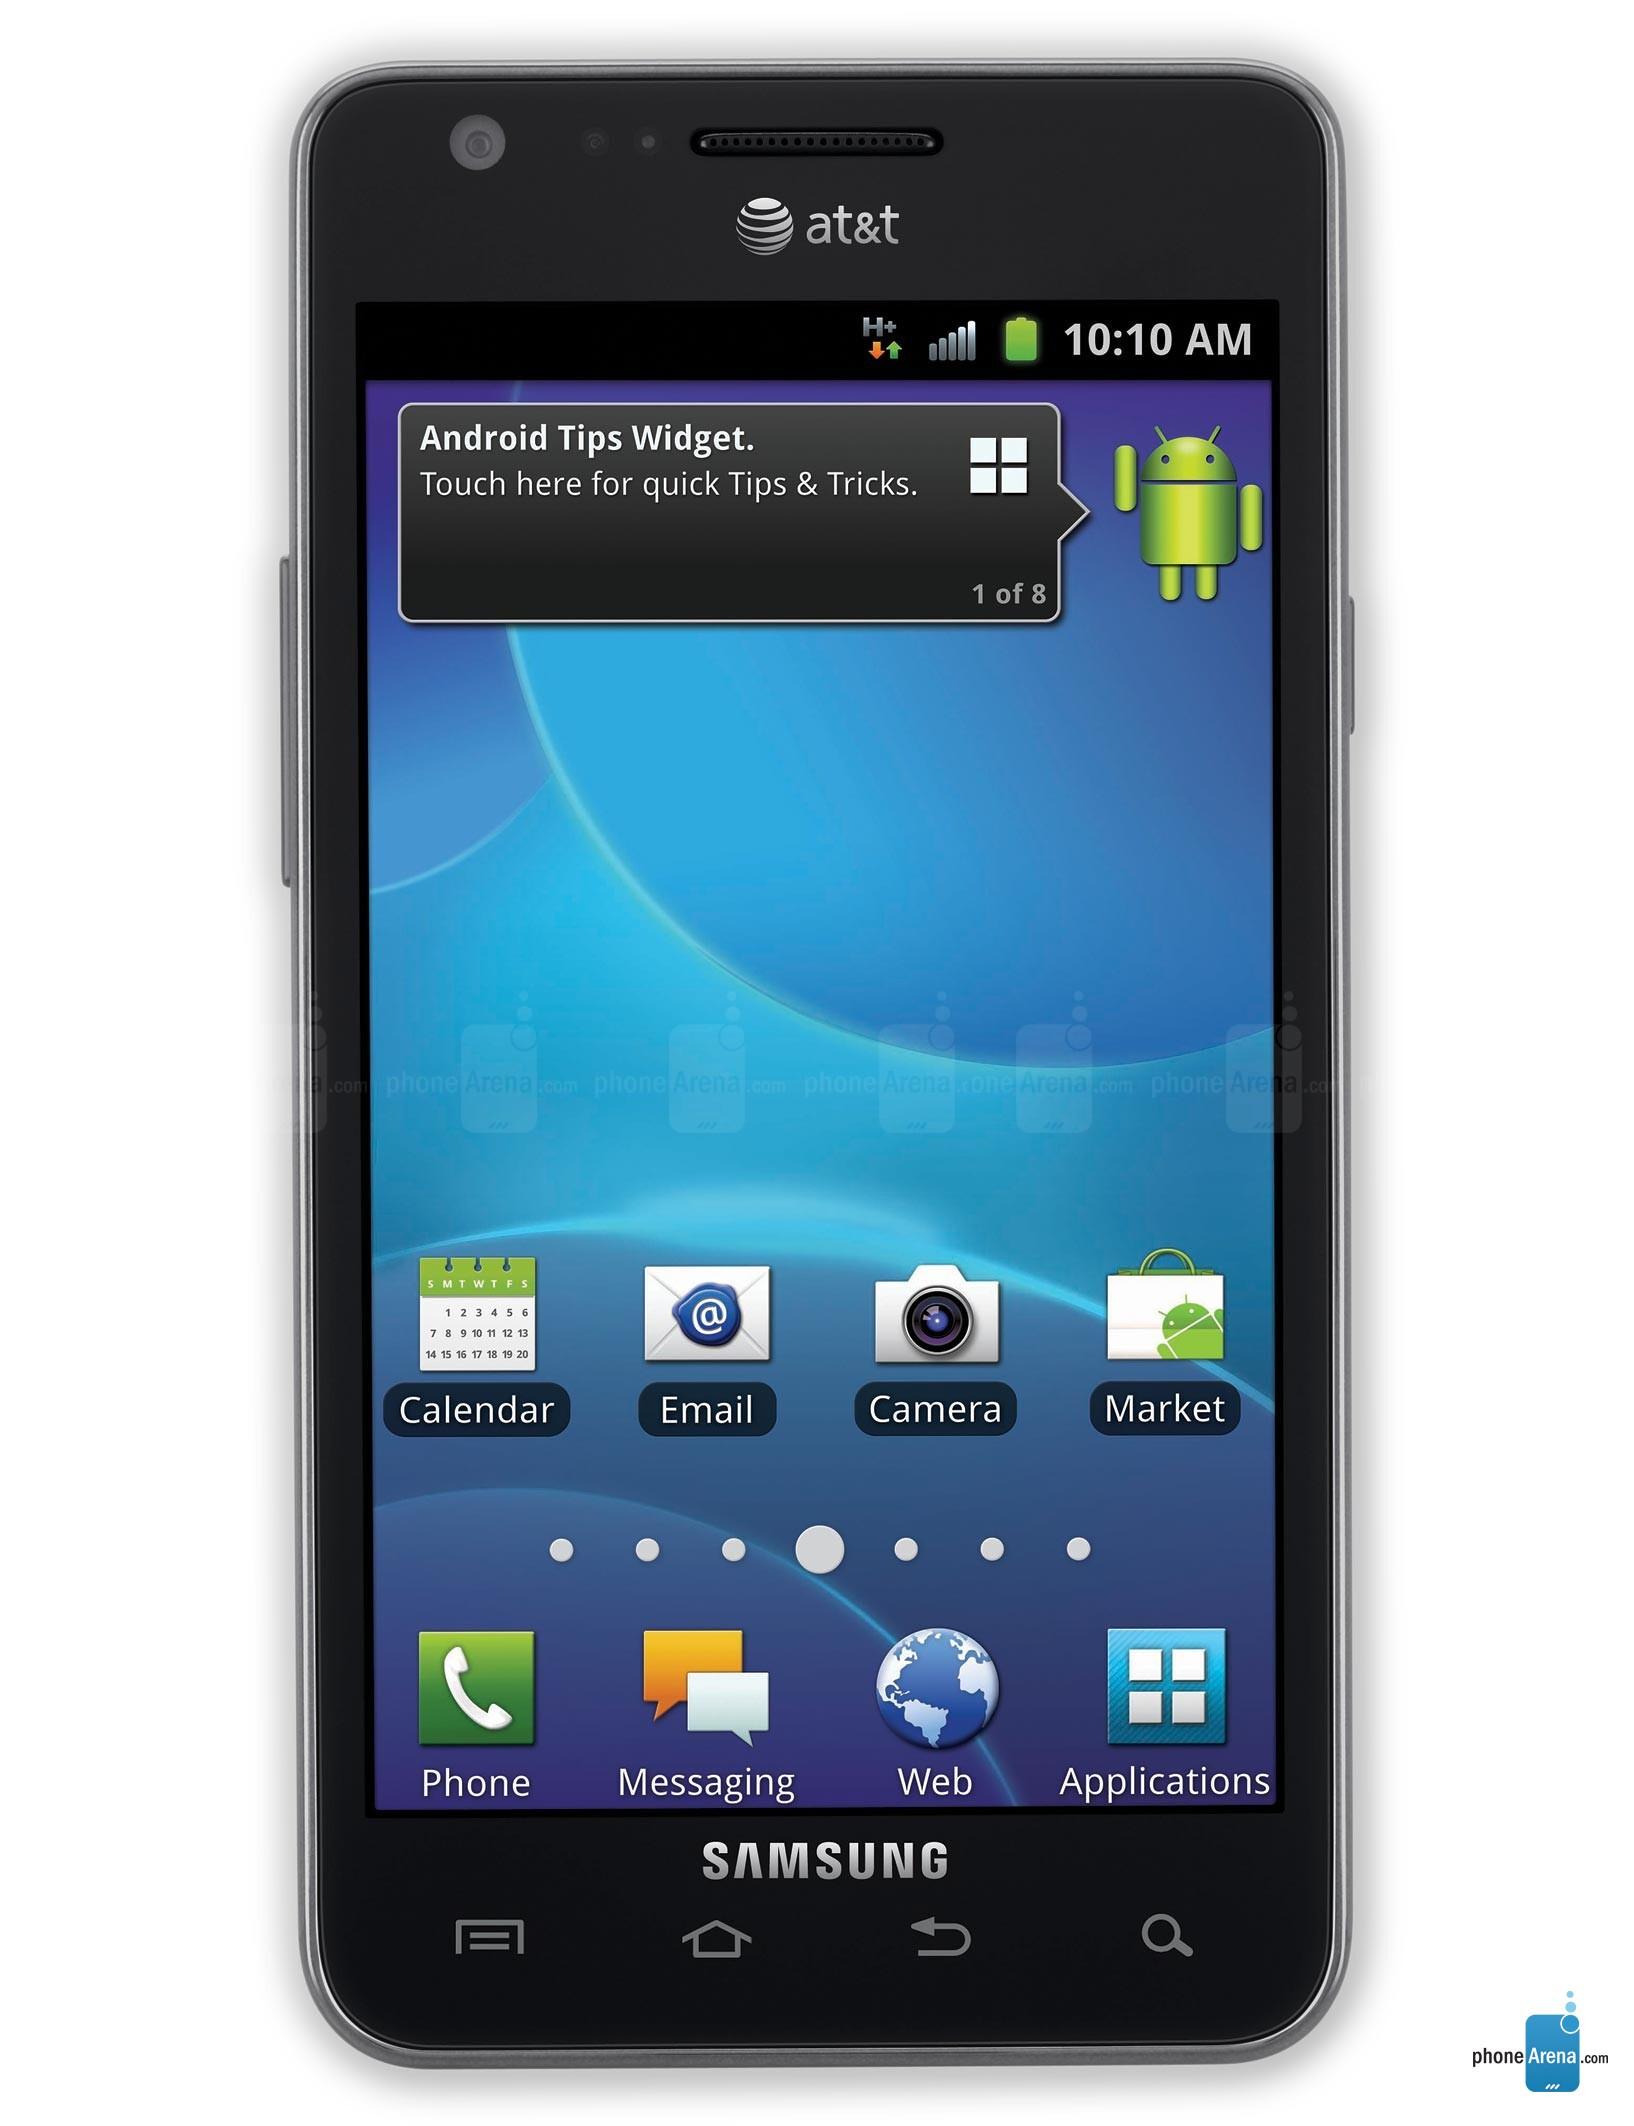 samsung galaxy s ii at t photos rh phonearena com Samsung Galaxy S 2 Samsung Galaxy S2 I777